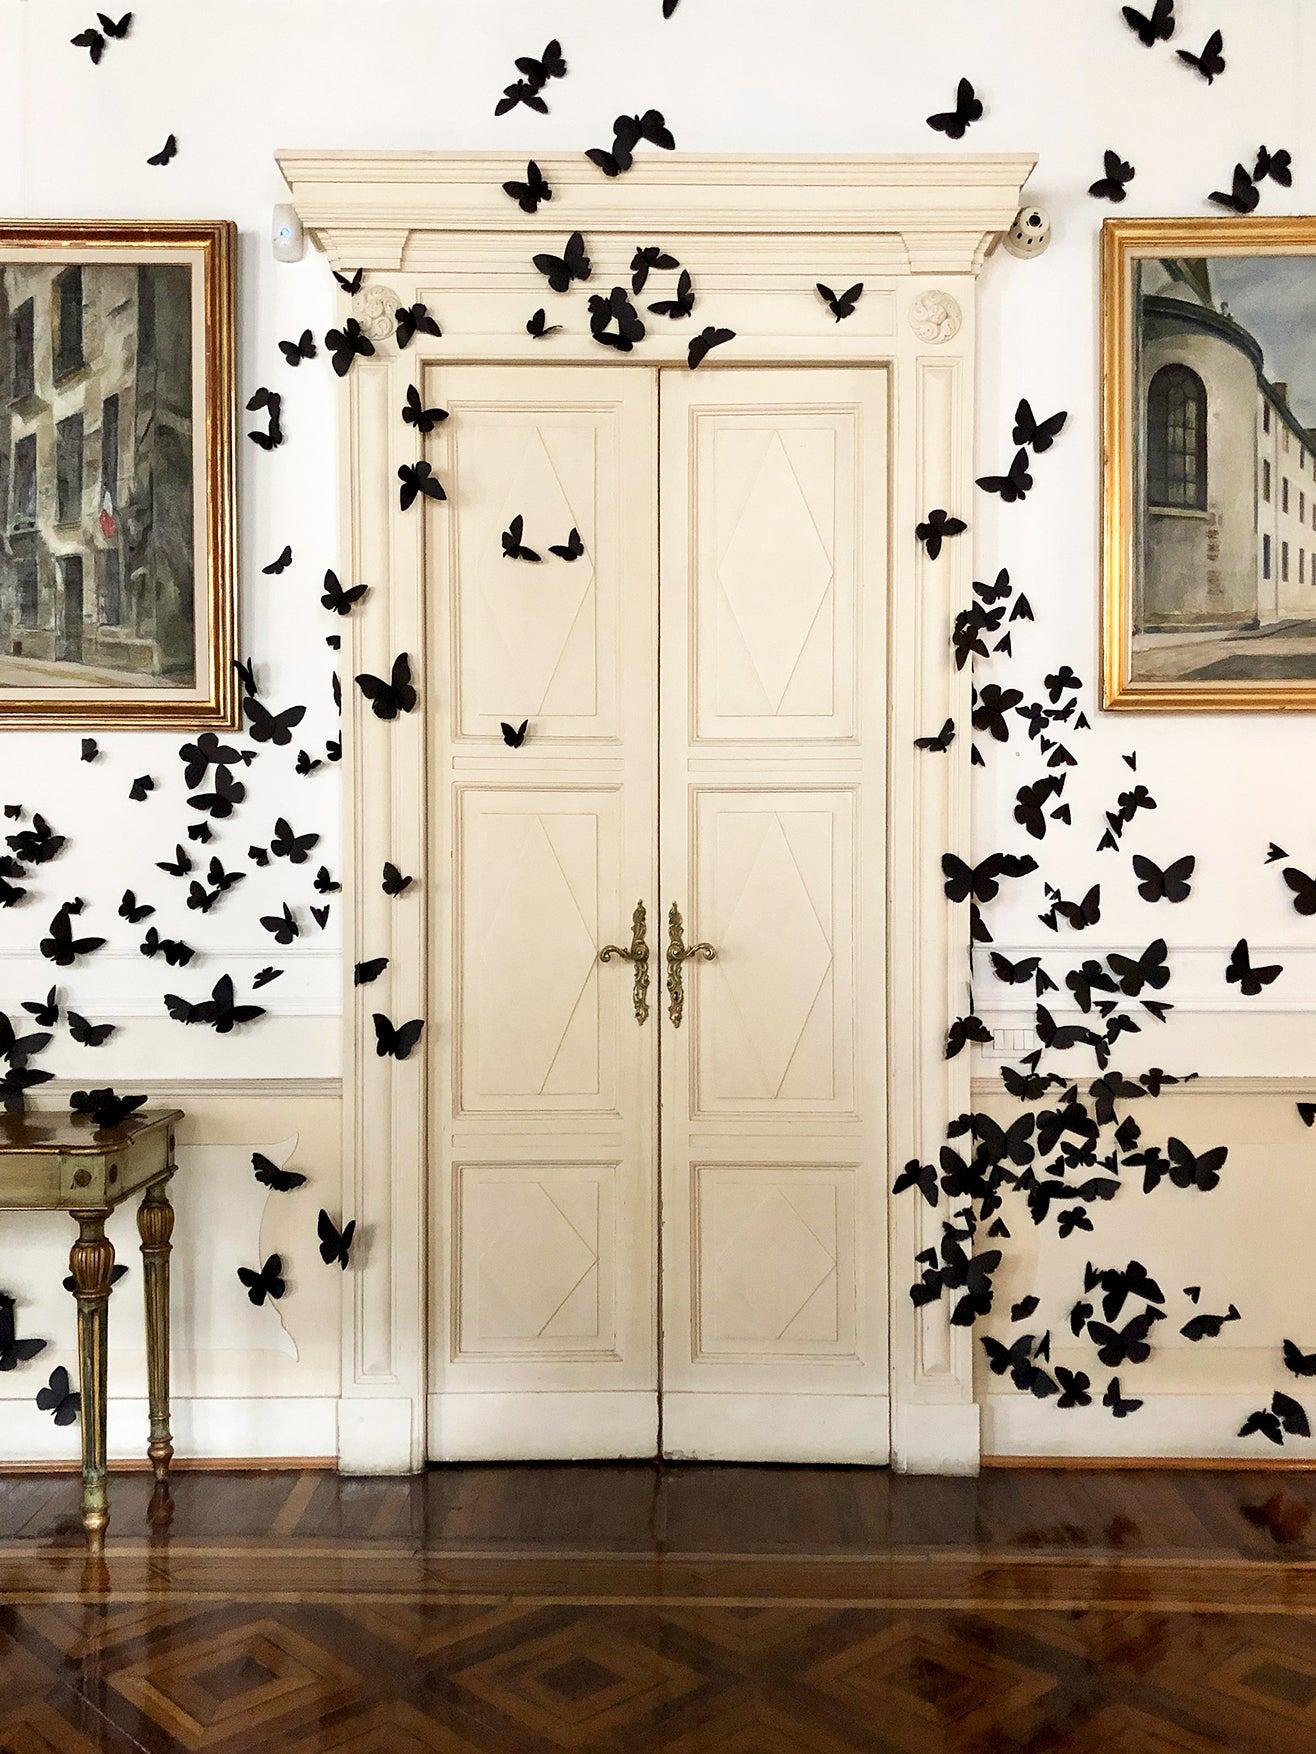 black butterflies swarm around an old doorway